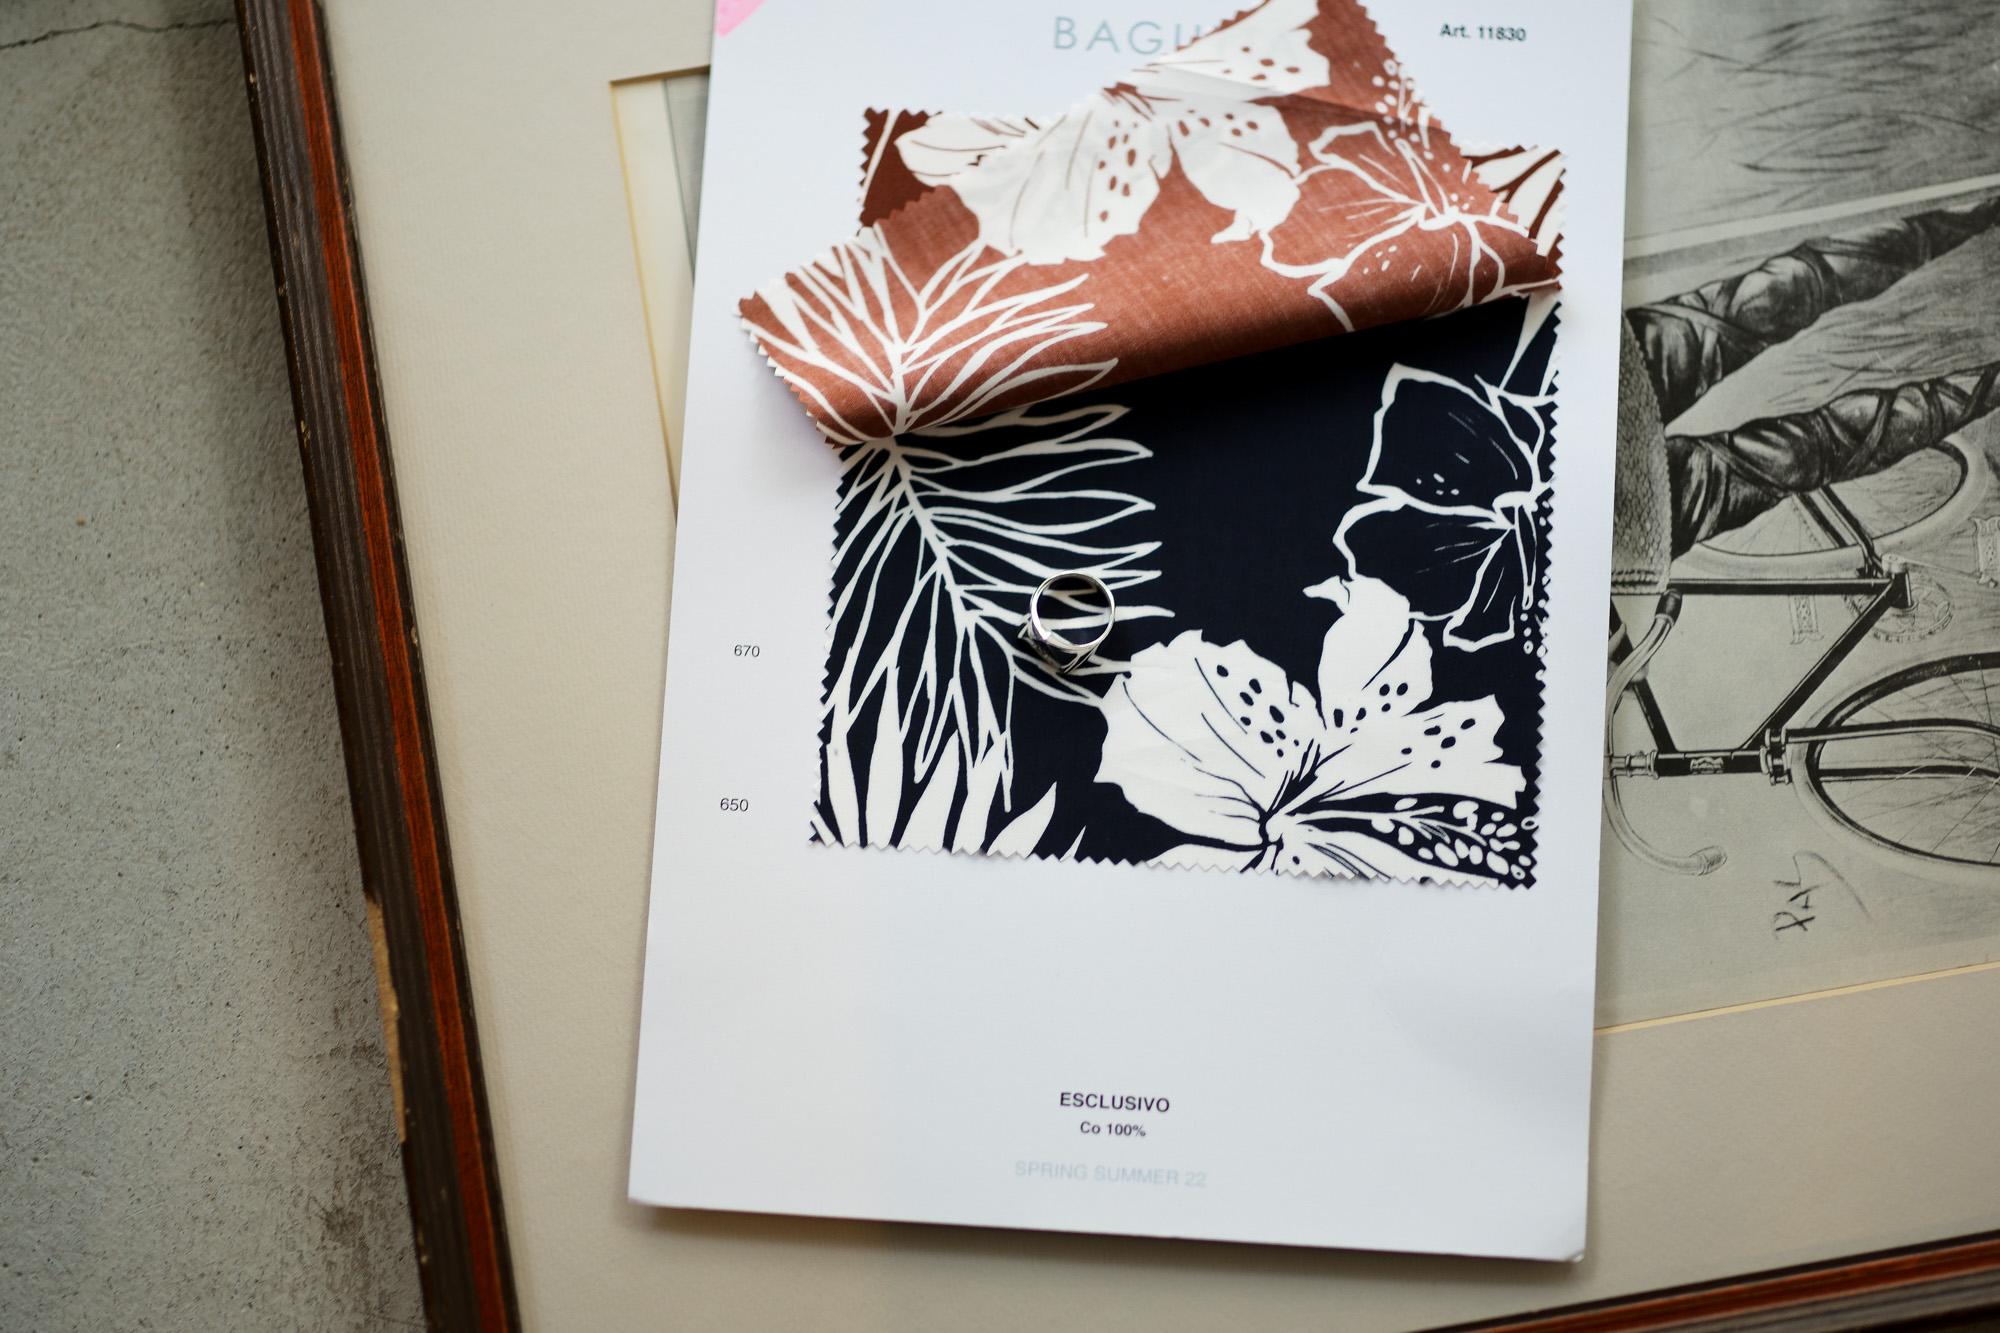 BAGUTTA(バグッタ) JOHNNY Art.11830 アロハシャツ NAVY(ネイビー・650) 2022 春夏 【ご予約開始】 愛知 名古屋 Alto e Diritto altoediritto アルトエデリット シャツ アロハ オープンカラーシャツ